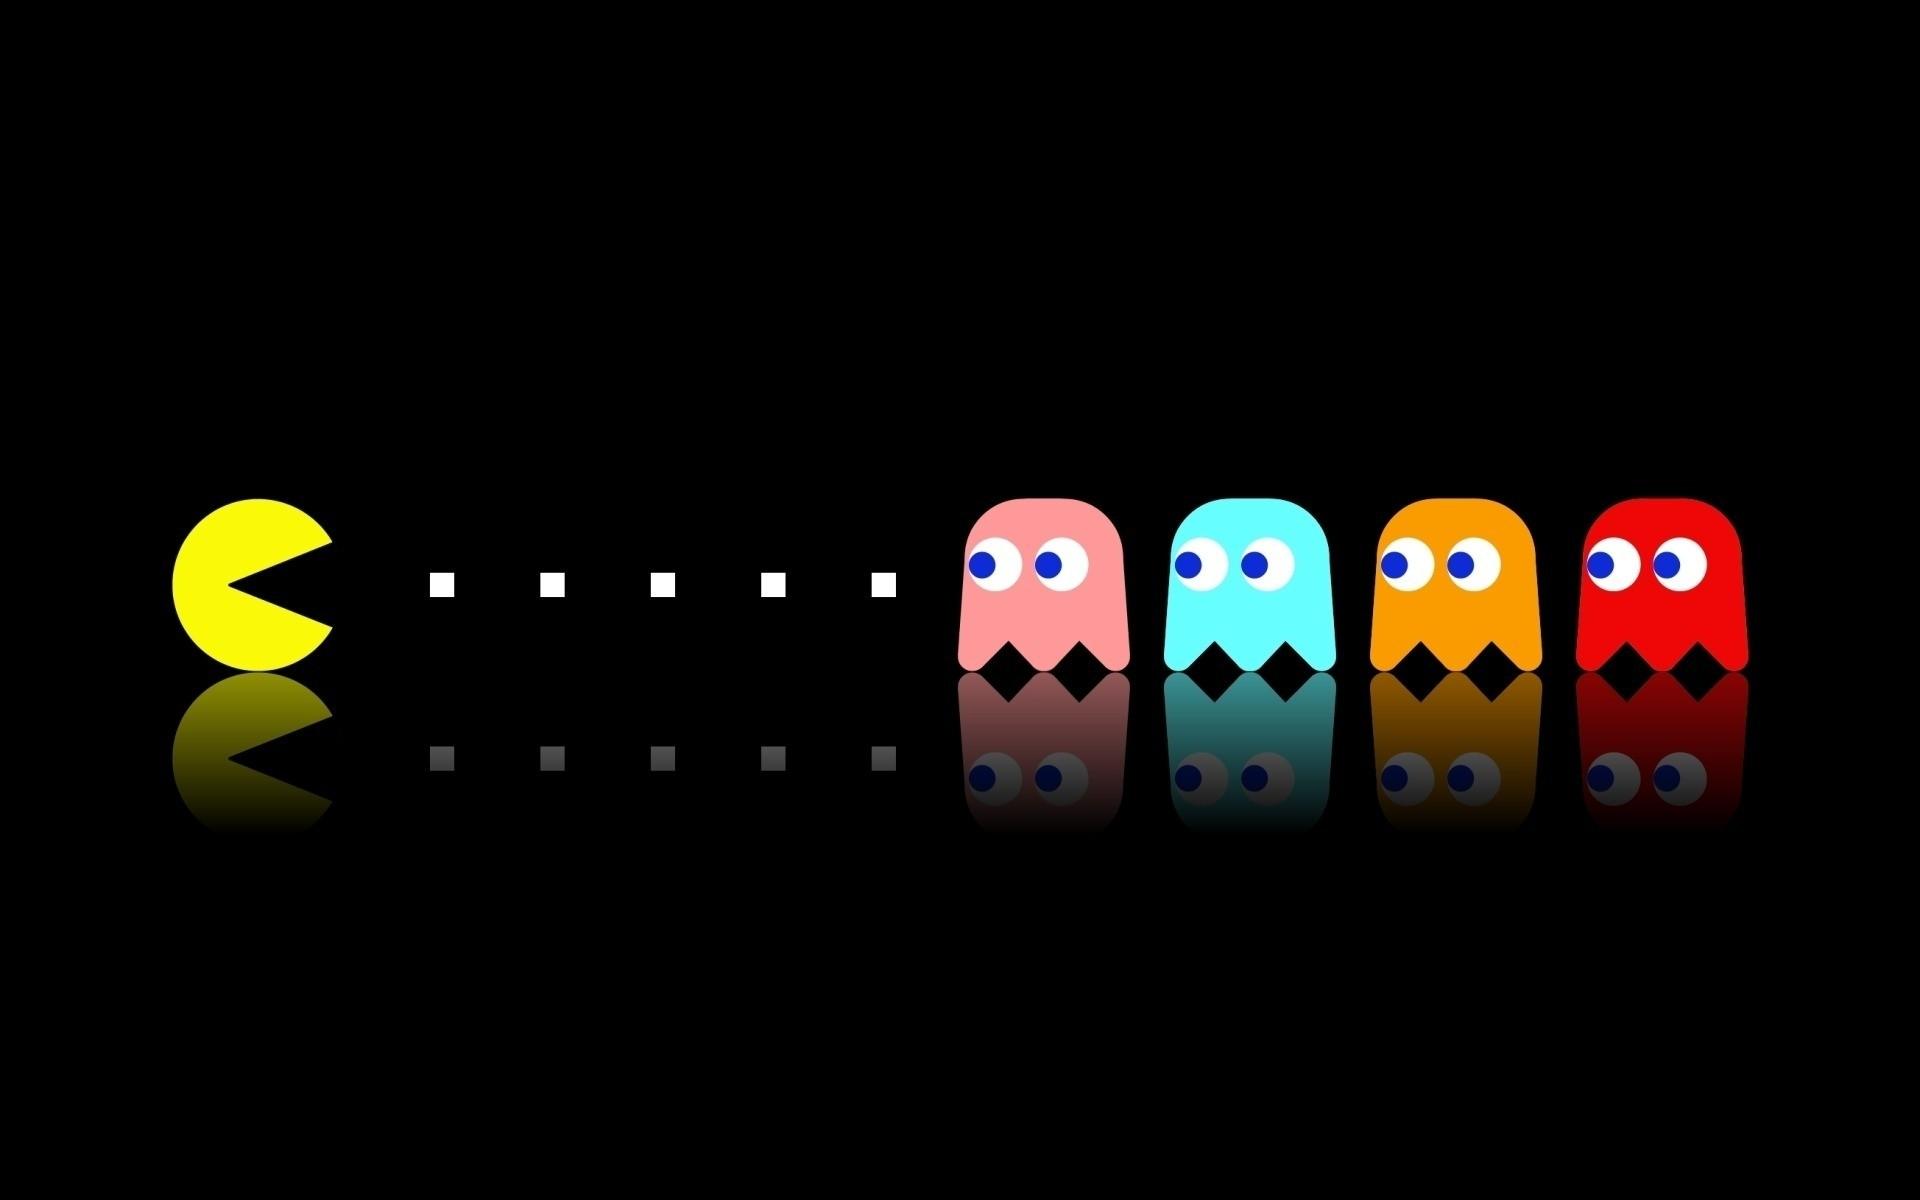 General 1920x1200 Pacman Pac-Man  video games